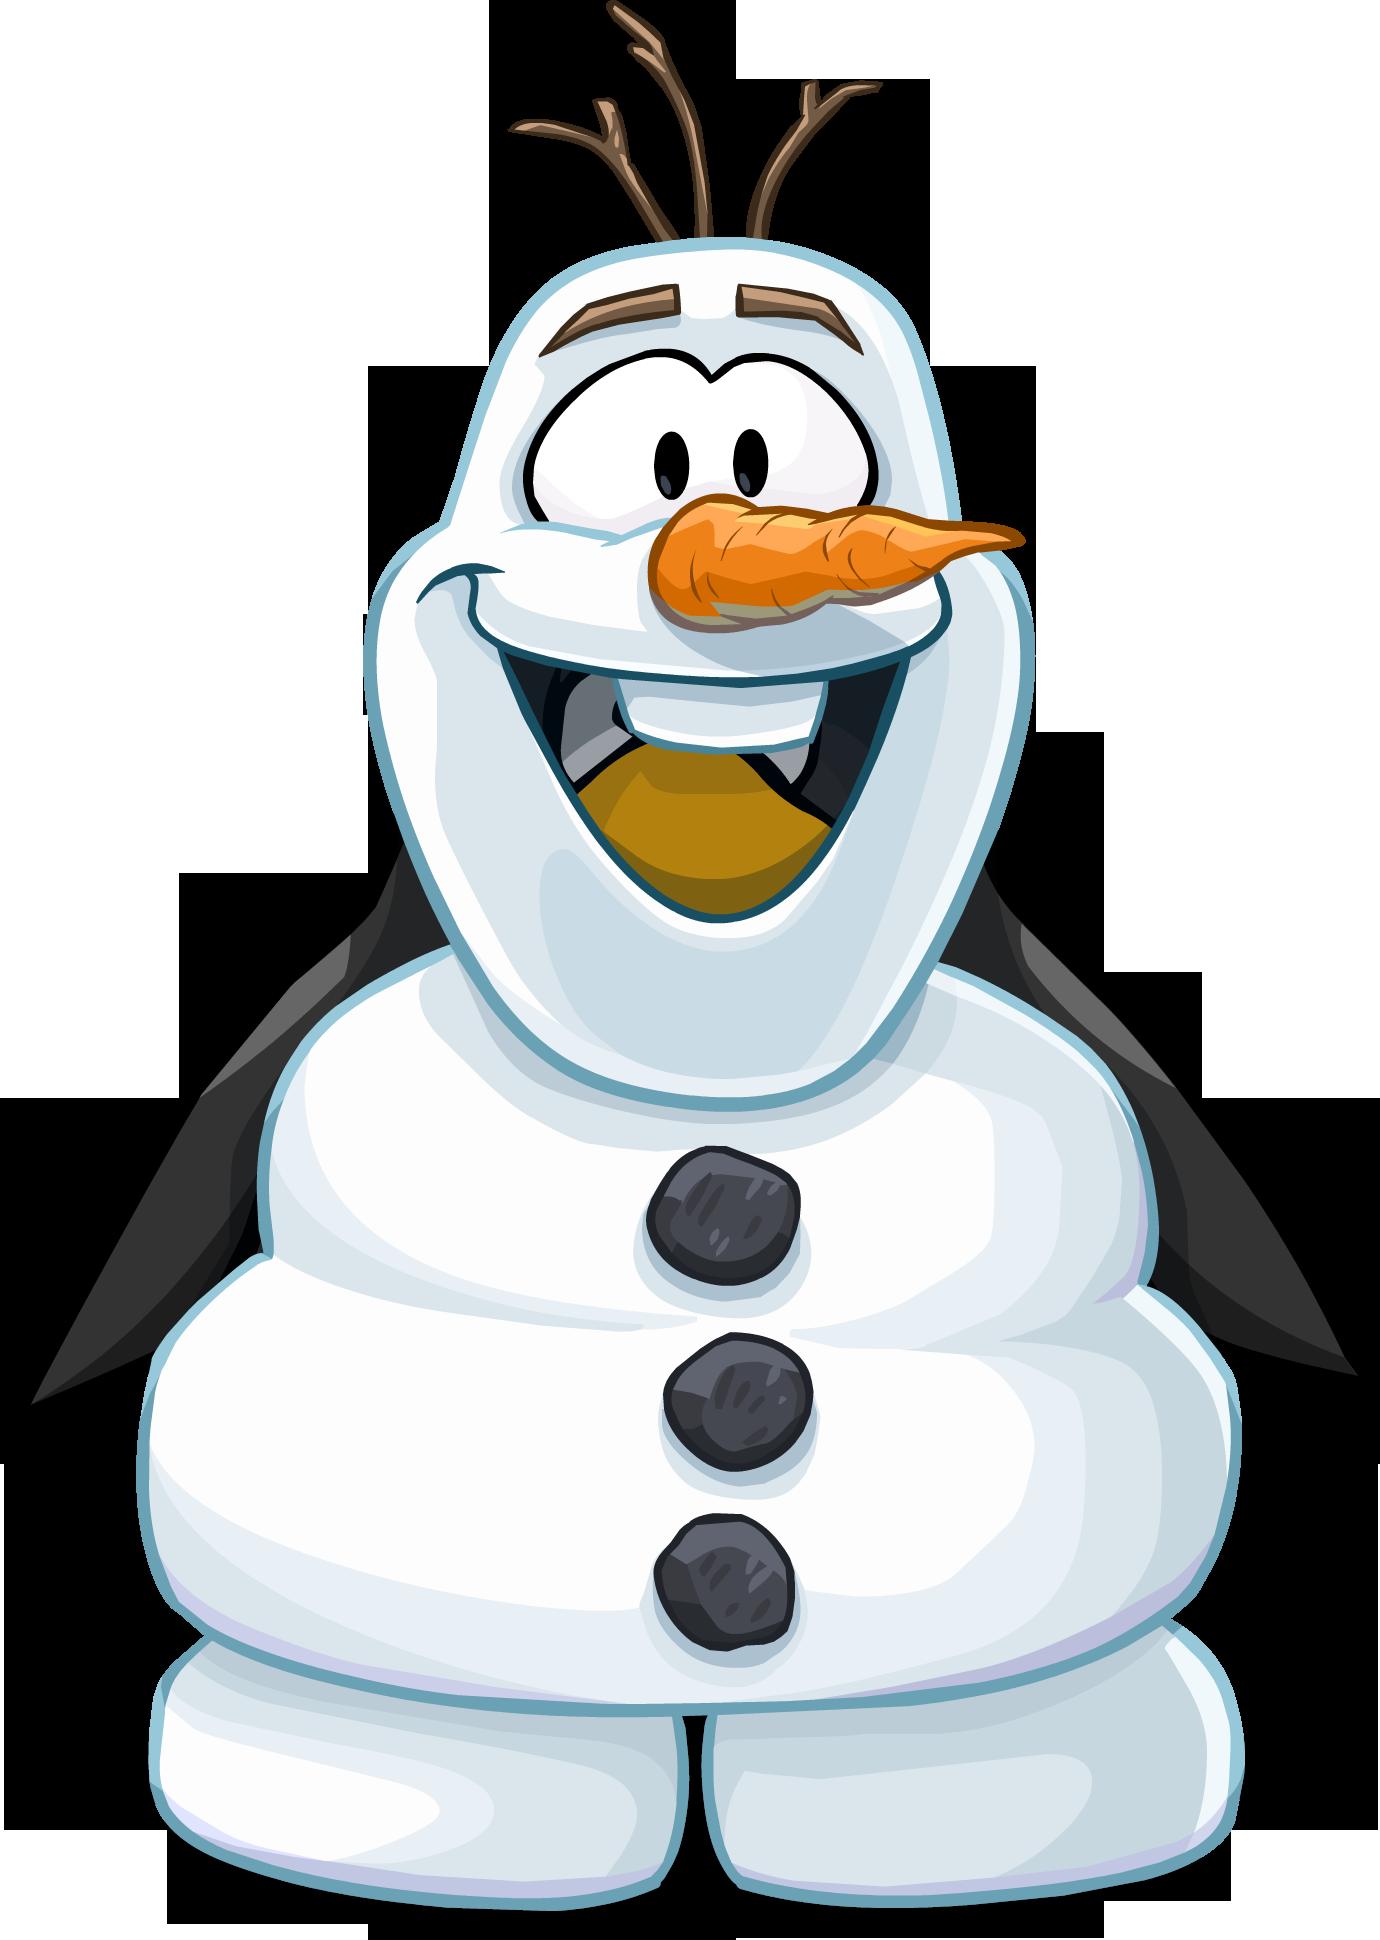 Olaf olof